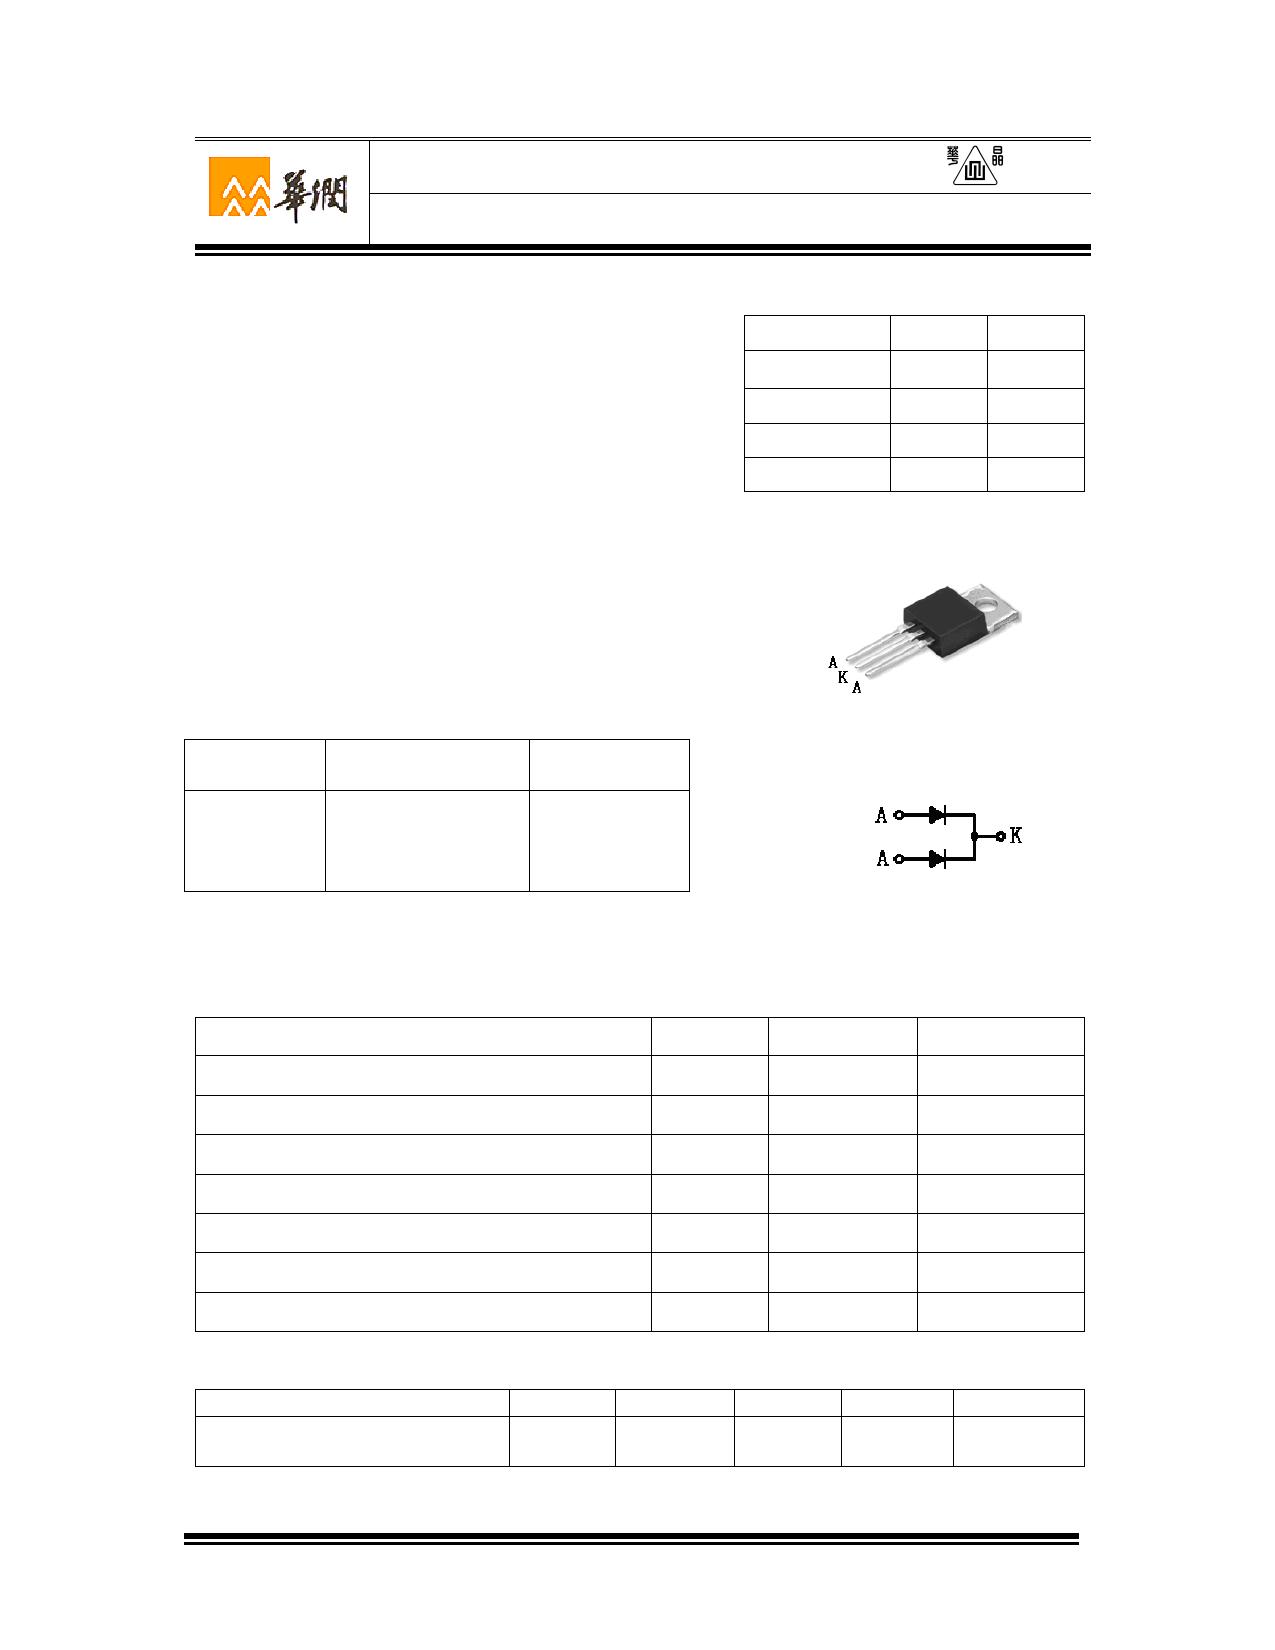 2CR122A8S Datasheet, 2CR122A8S PDF,ピン配置, 機能